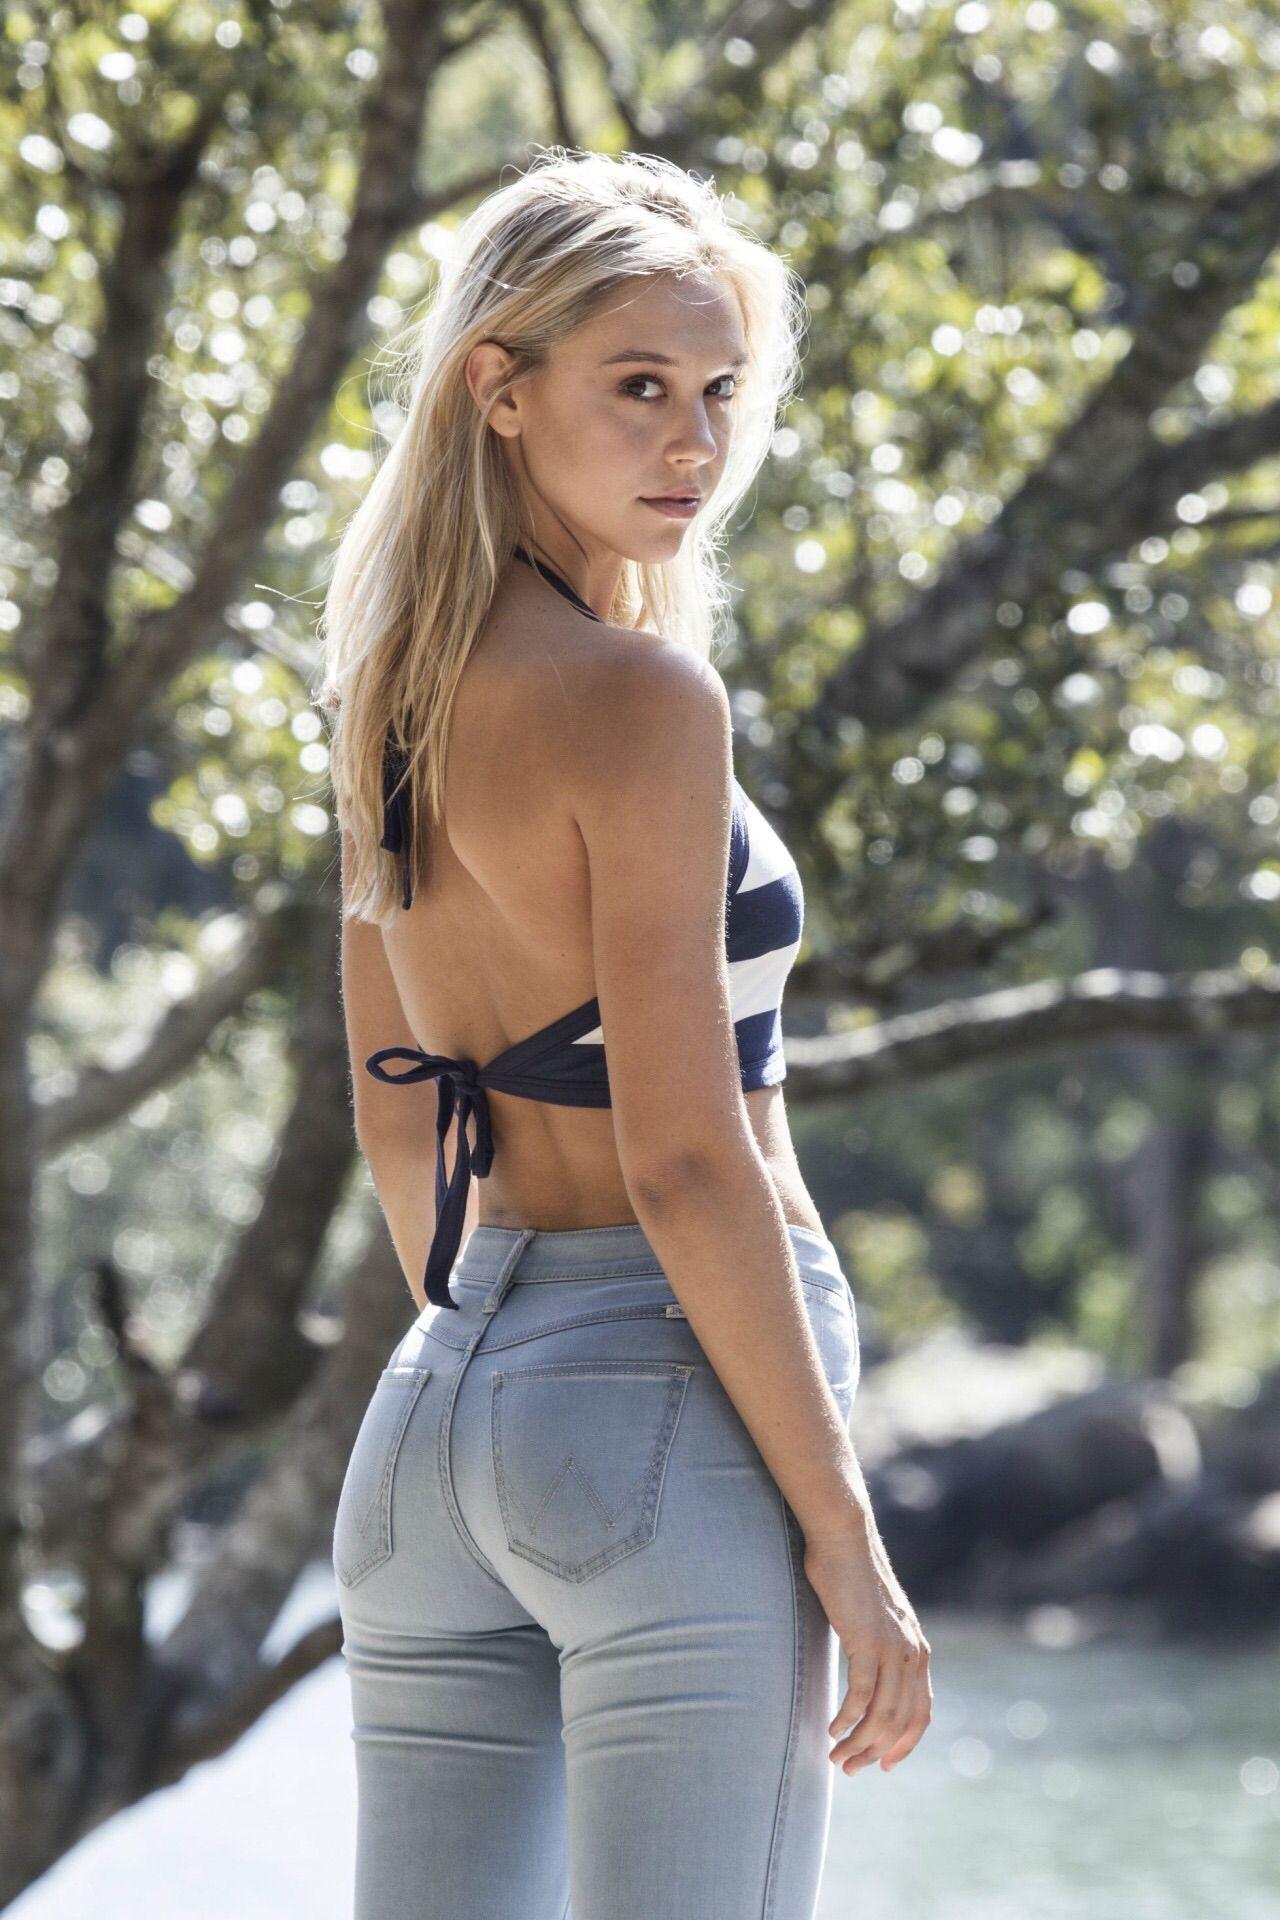 Ass Alexis Ren naked (51 photo), Topless, Leaked, Boobs, butt 2019